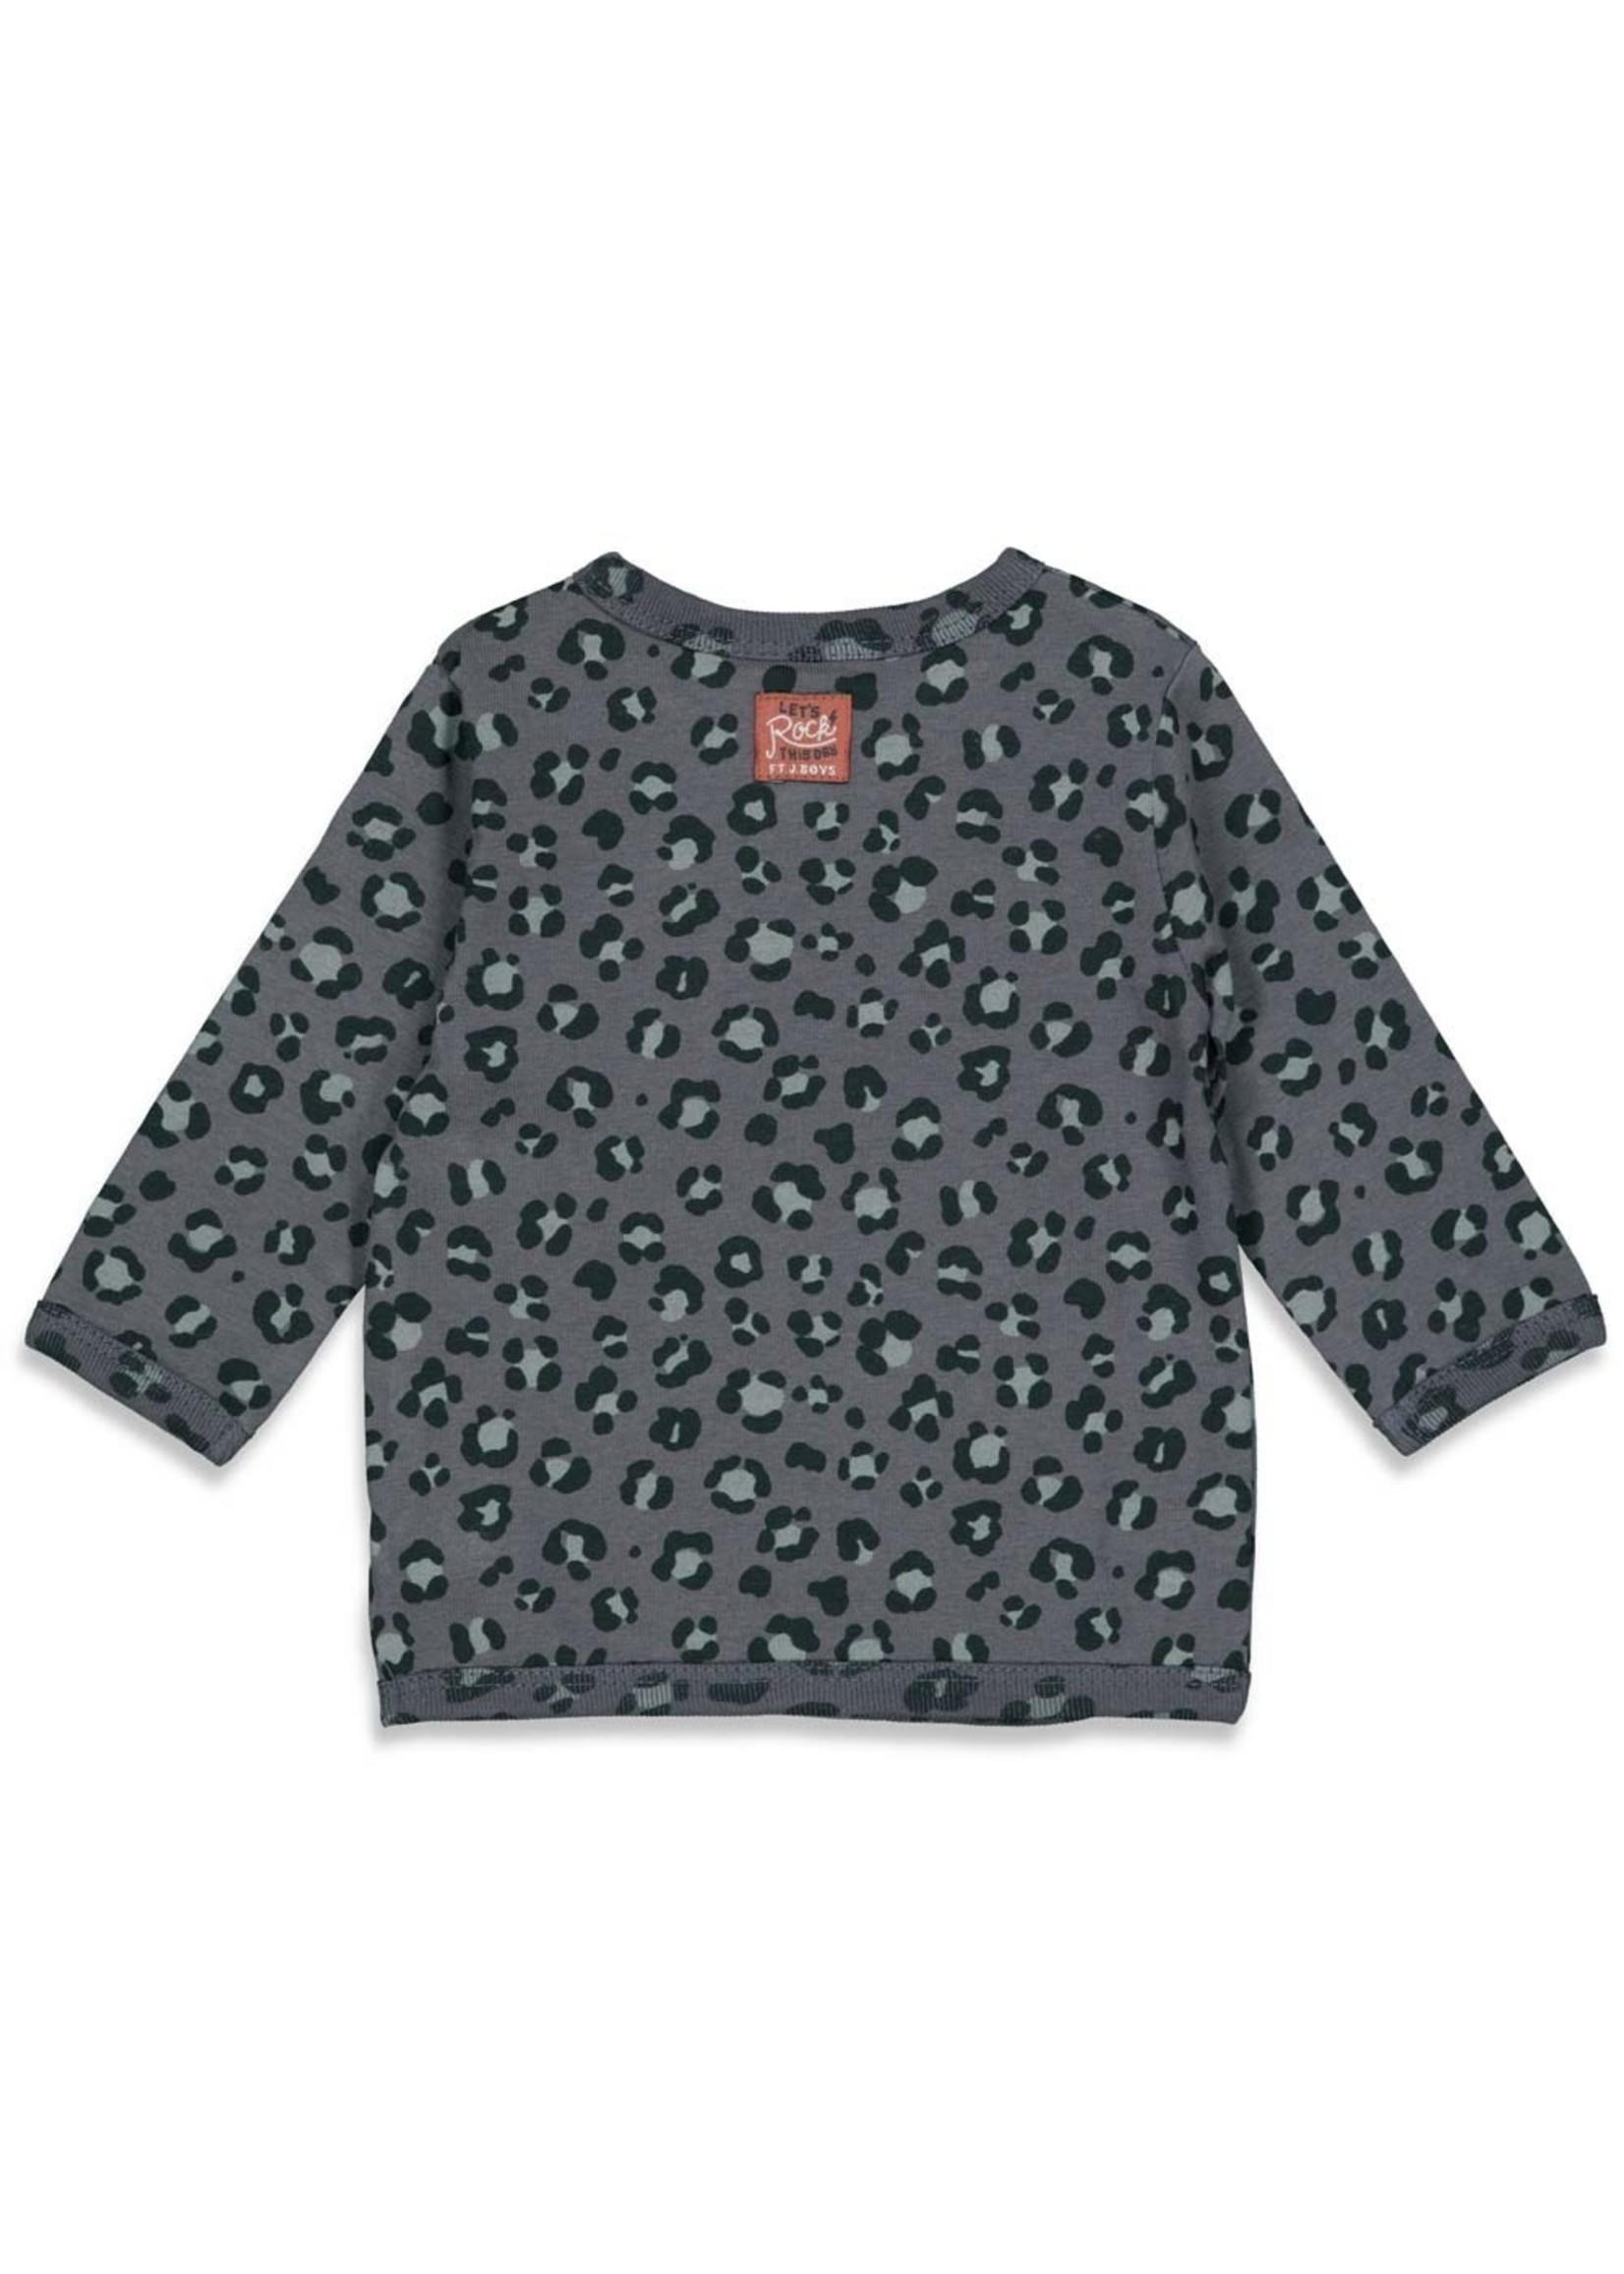 Feetje Overslagshirt - Wild Thing